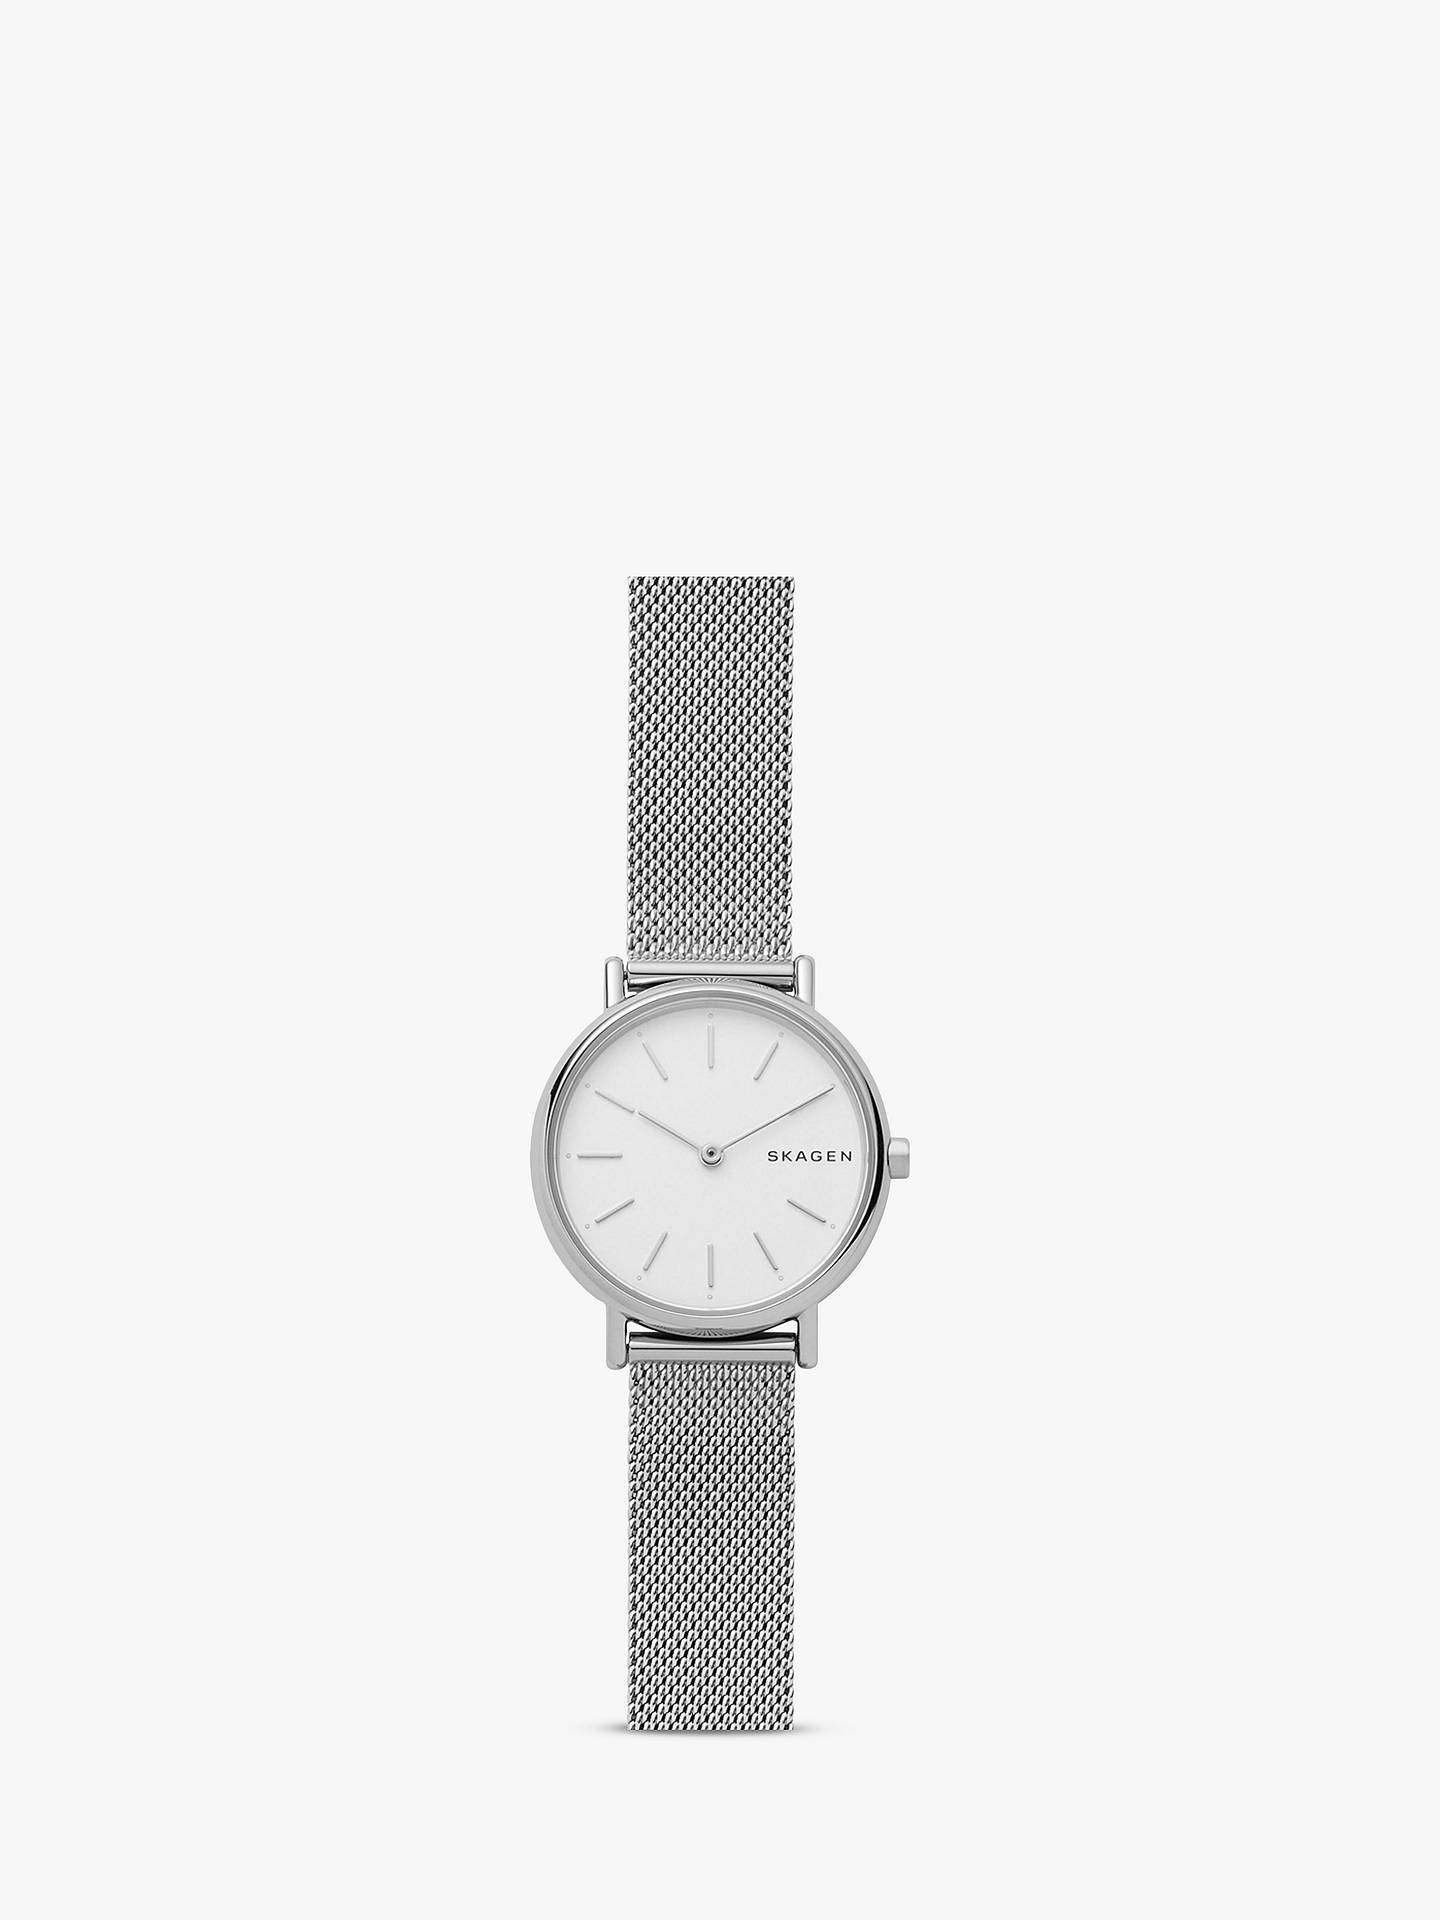 ef410a07ca0 Skagen Women s Signatur Mesh Bracelet Strap Watch at John Lewis ...